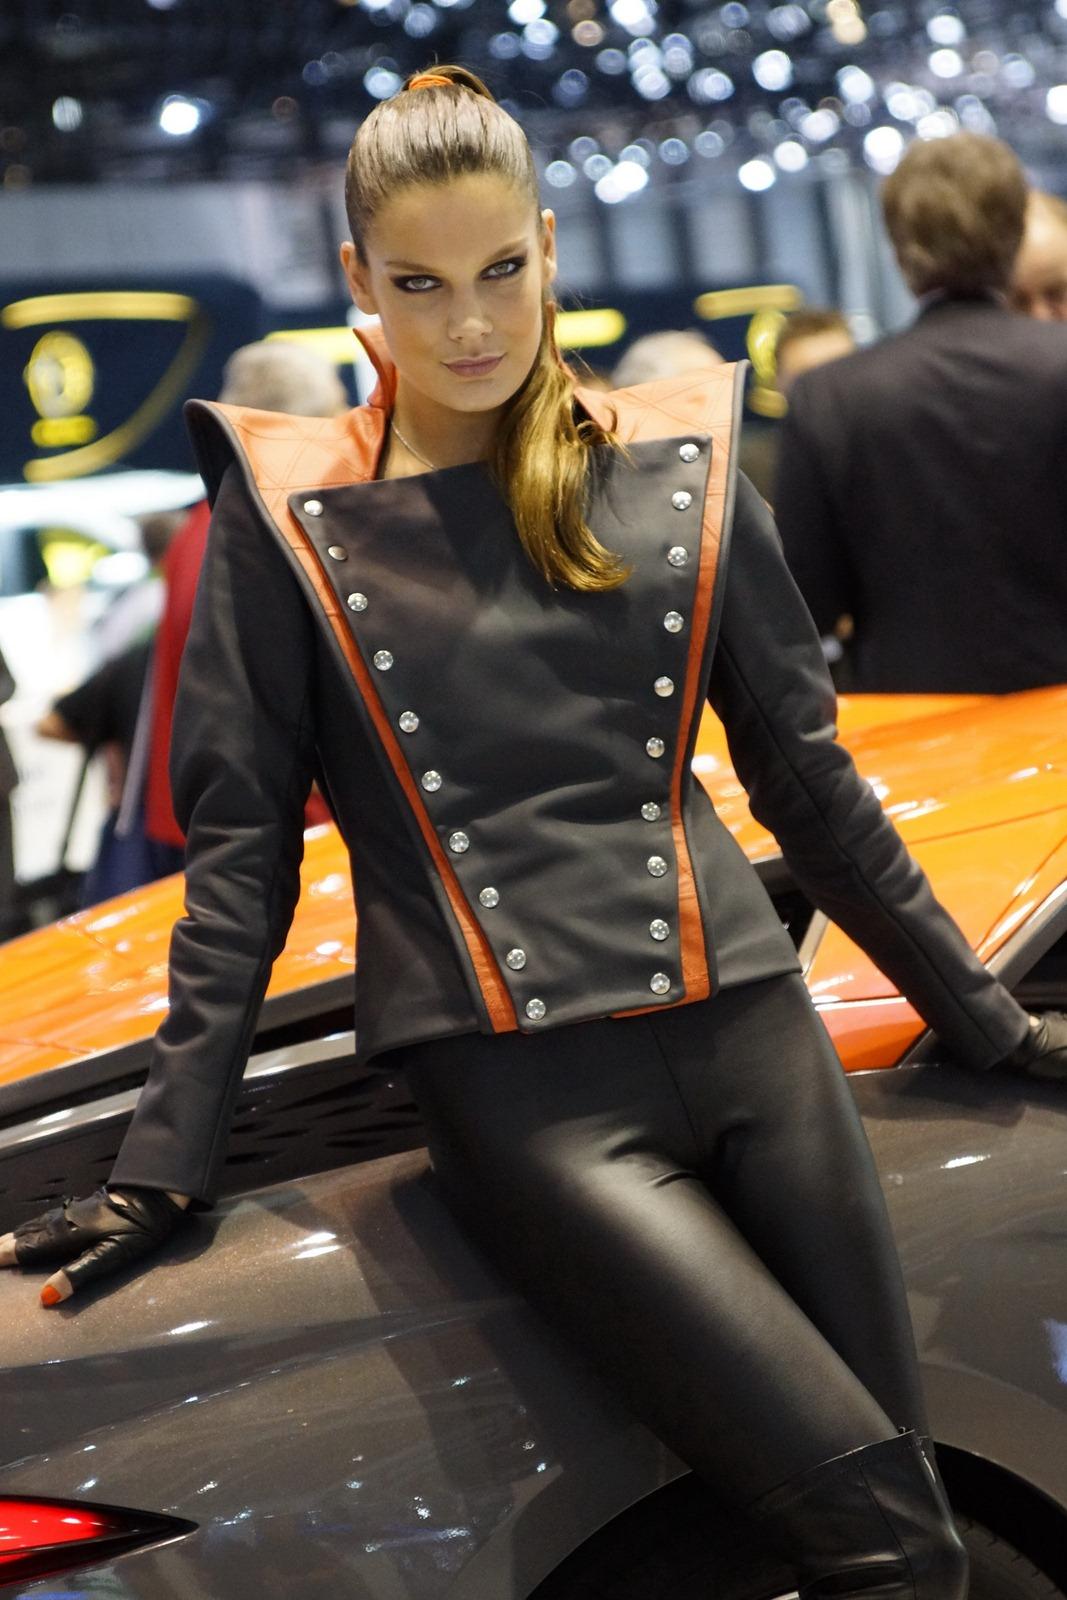 Vw Of America >> 2012 Geneva Motor Show Girls - AutoTribute